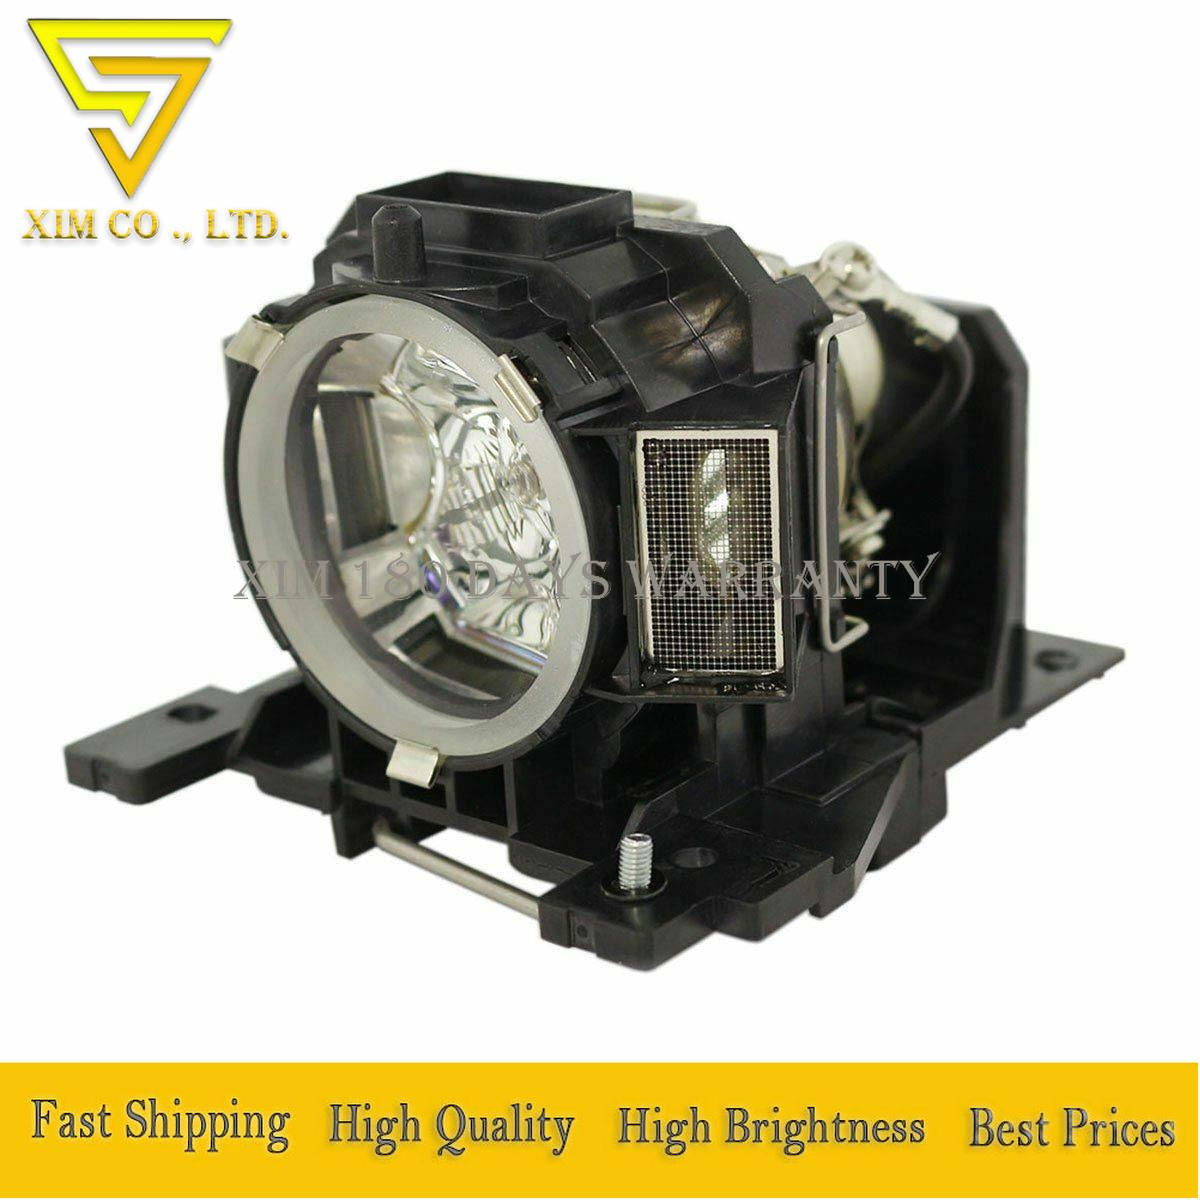 DT00891 CP-A100 ED-A100 ED-A110 CP-A101 CP-A100 A100J A101i /ED-A100 ED-A100J ED-A110 ED-A110J HCP-A8 for Hitachi Projector Lamp original projector lamp dt01151 for hitachi cp rx79 cp rx82 cp rx93 ed x26